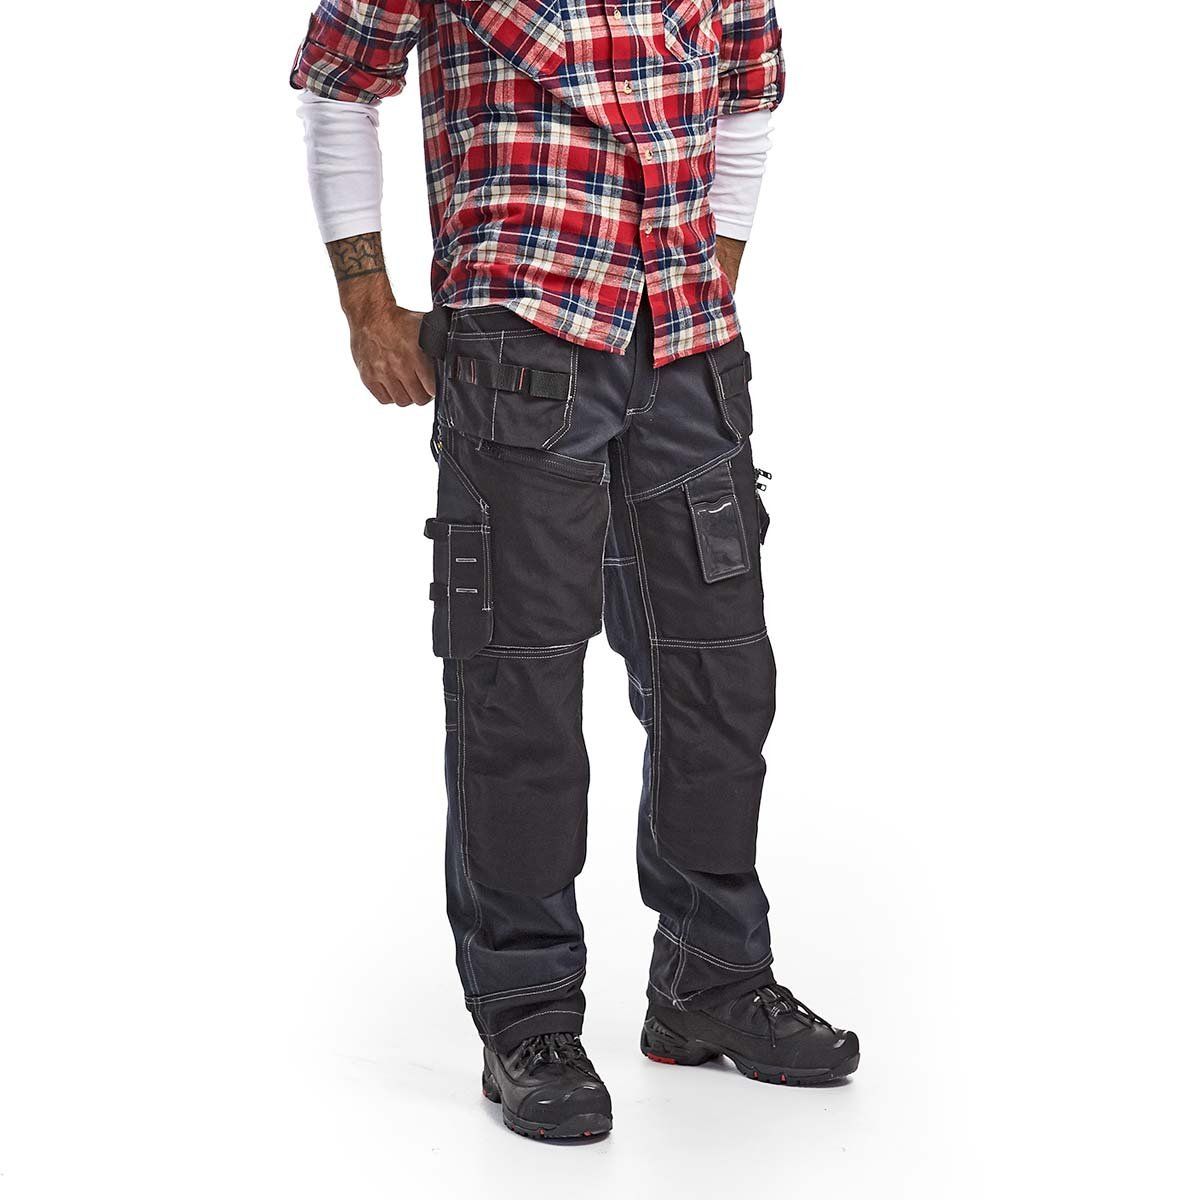 18db16ddf1a Blakläder 150011408999C146 Size C146 Craftsman Trousers - Navy Blue/Black:  Amazon.co.uk: DIY & Tools